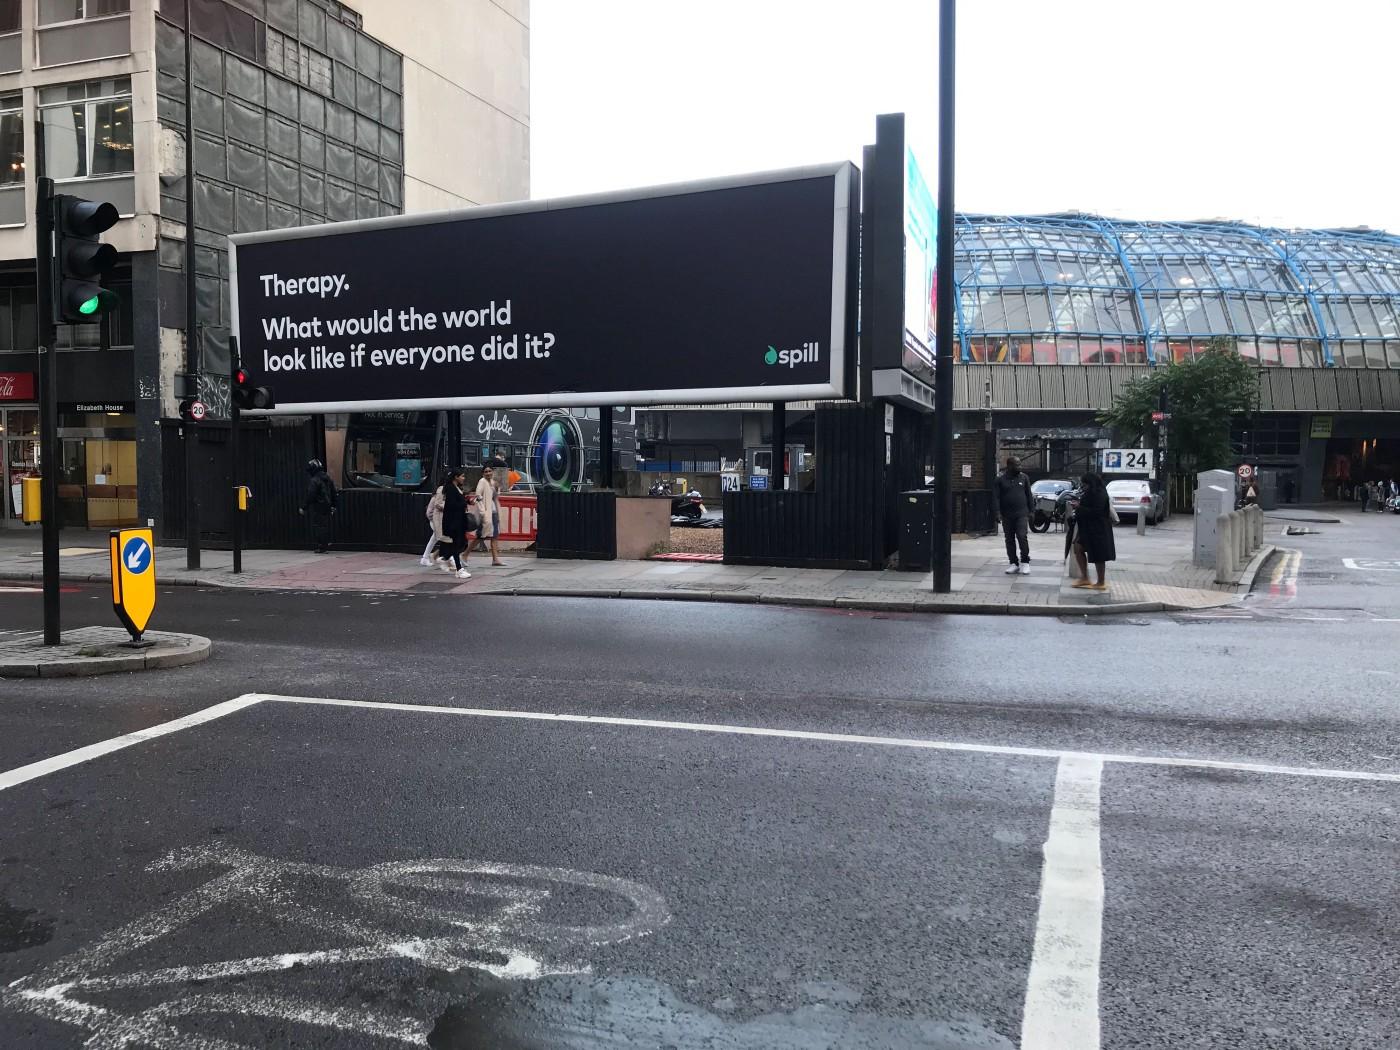 Spill advert on billboard